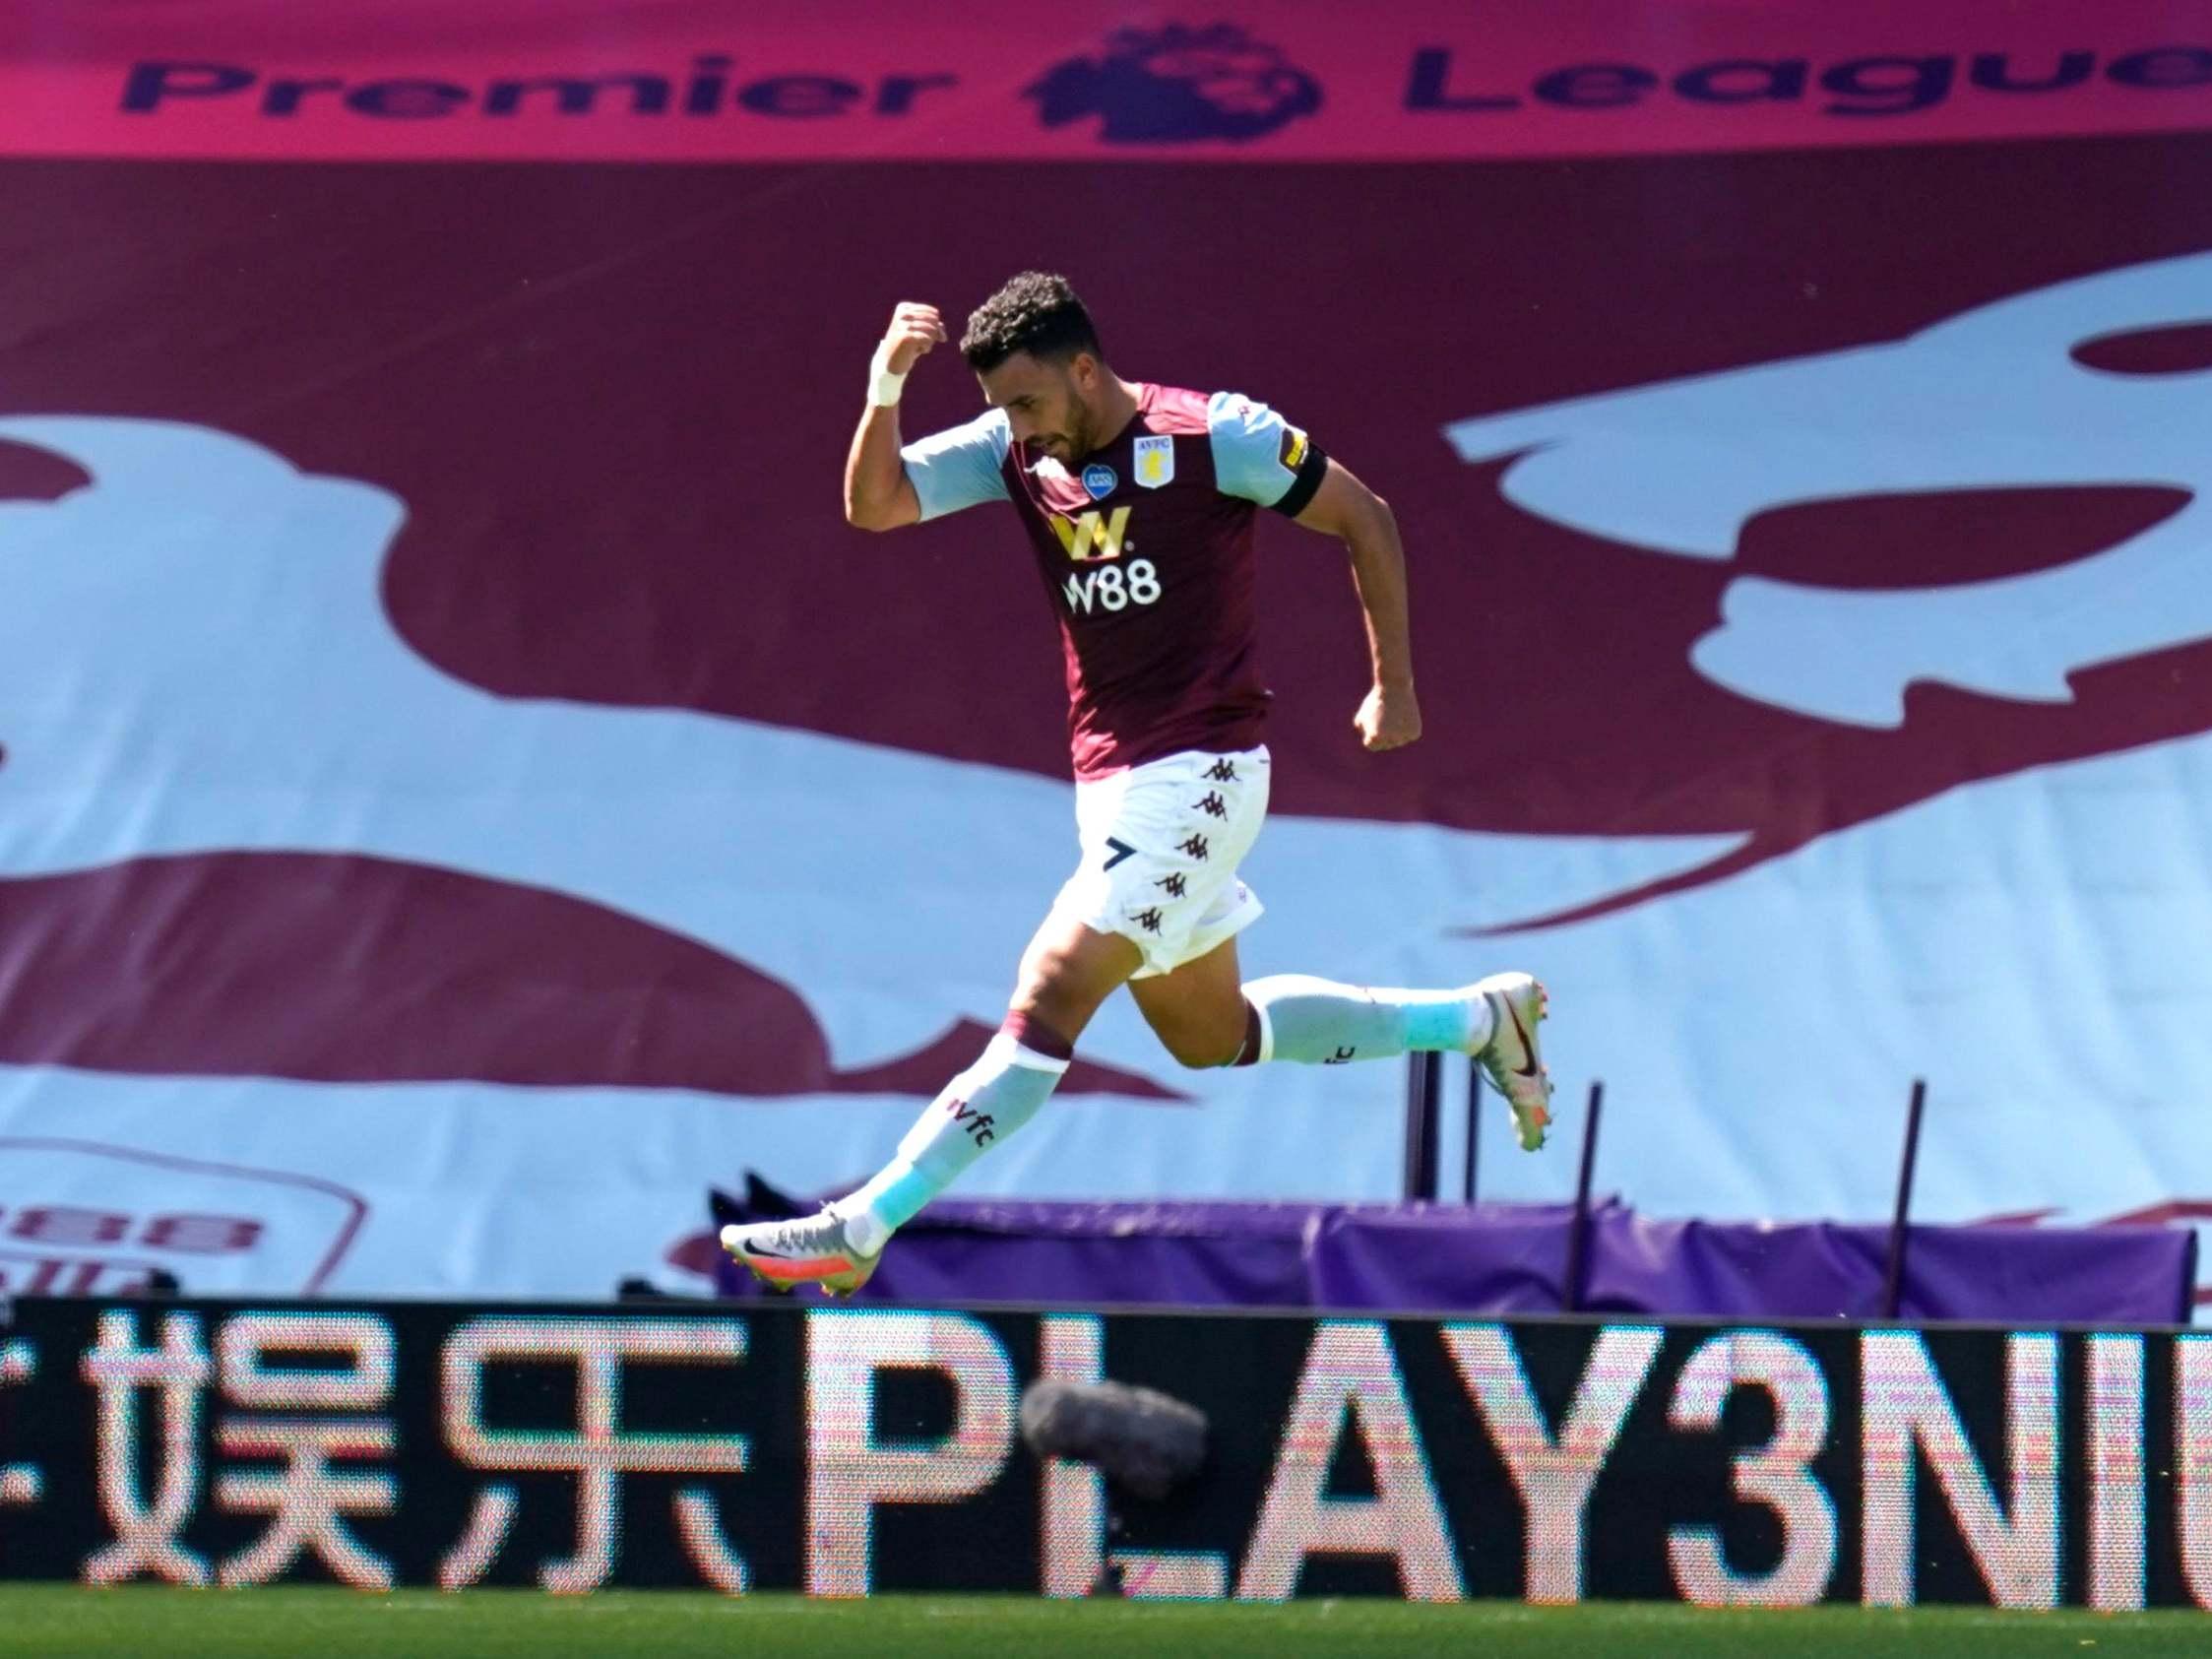 Aston Villa vs Crystal Palace LIVE - Latest updates